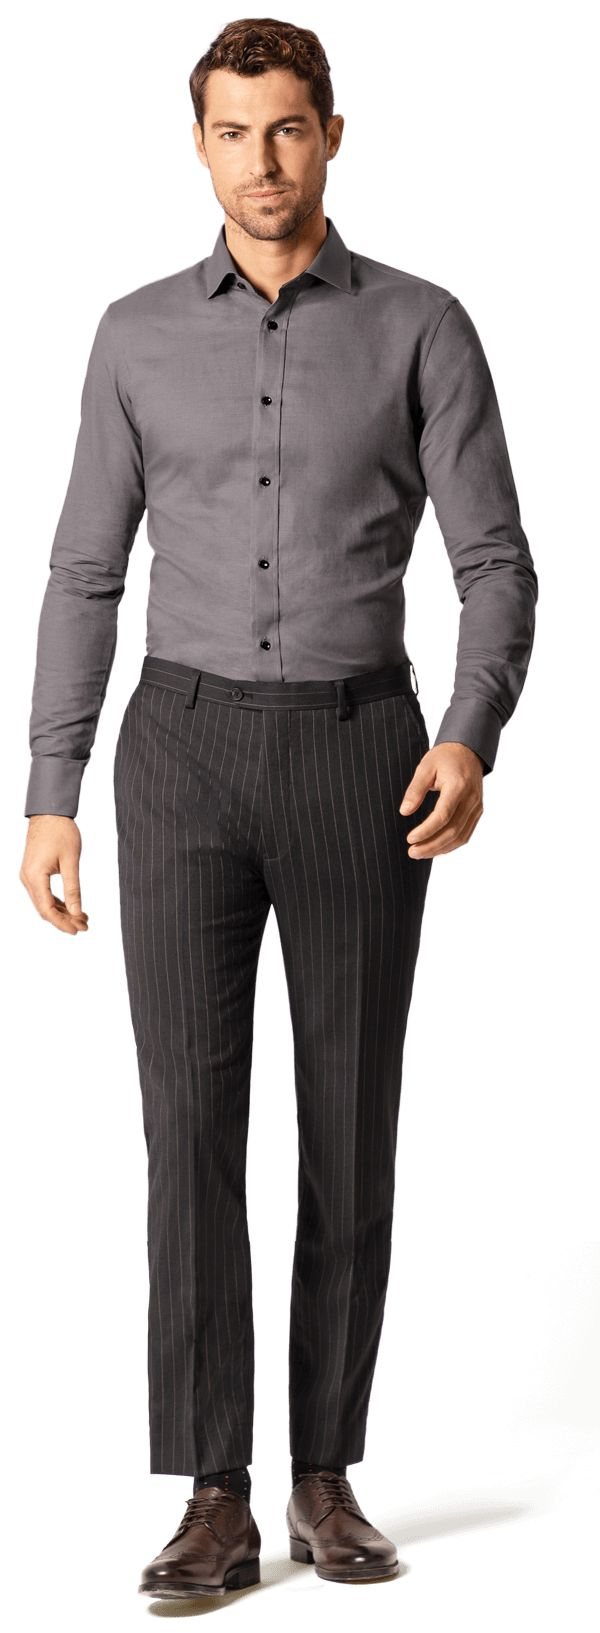 chemise grise